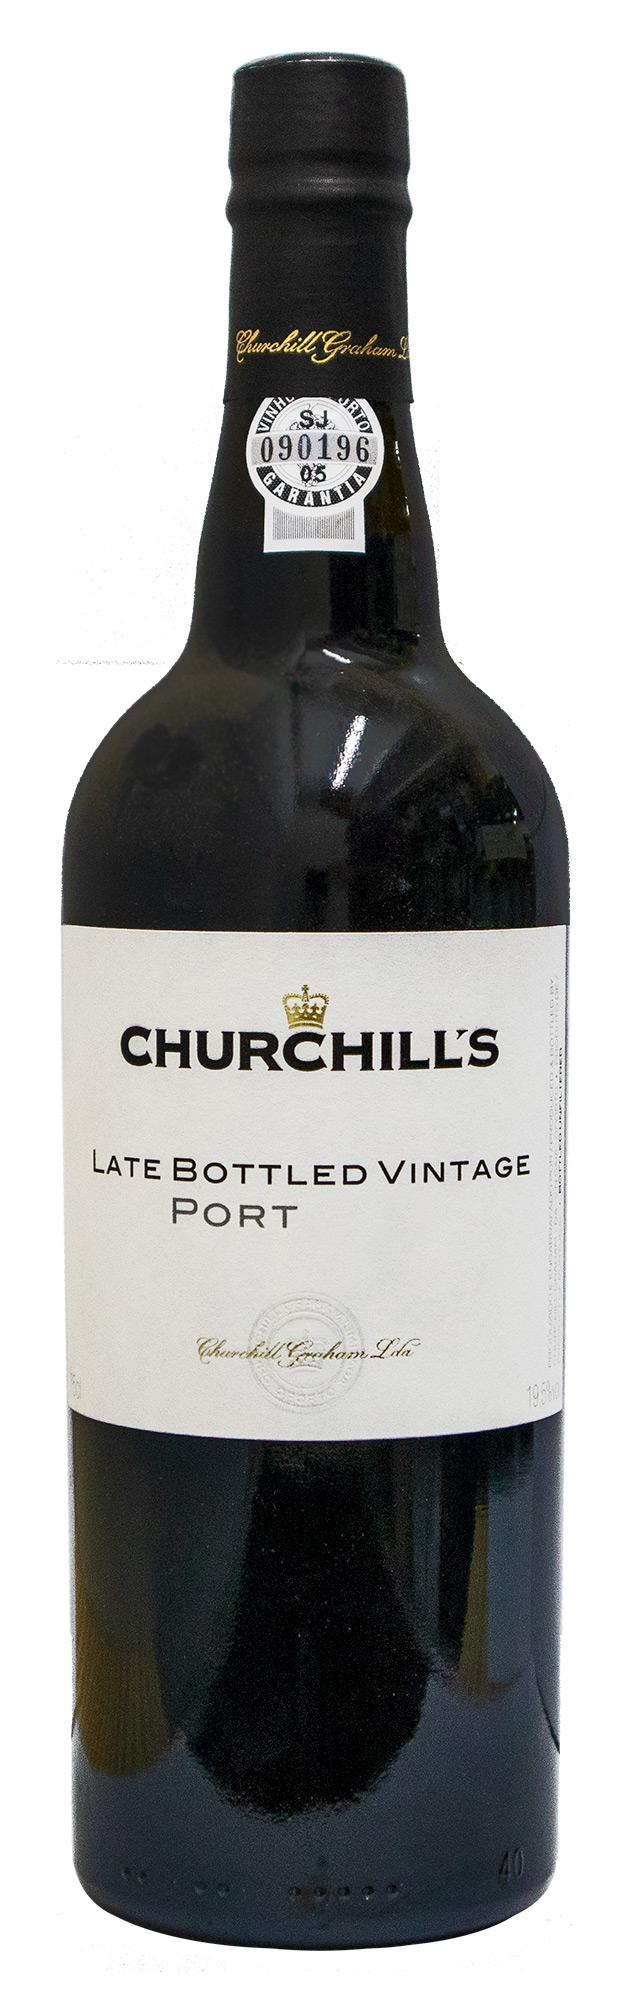 Churchills LBV 2012